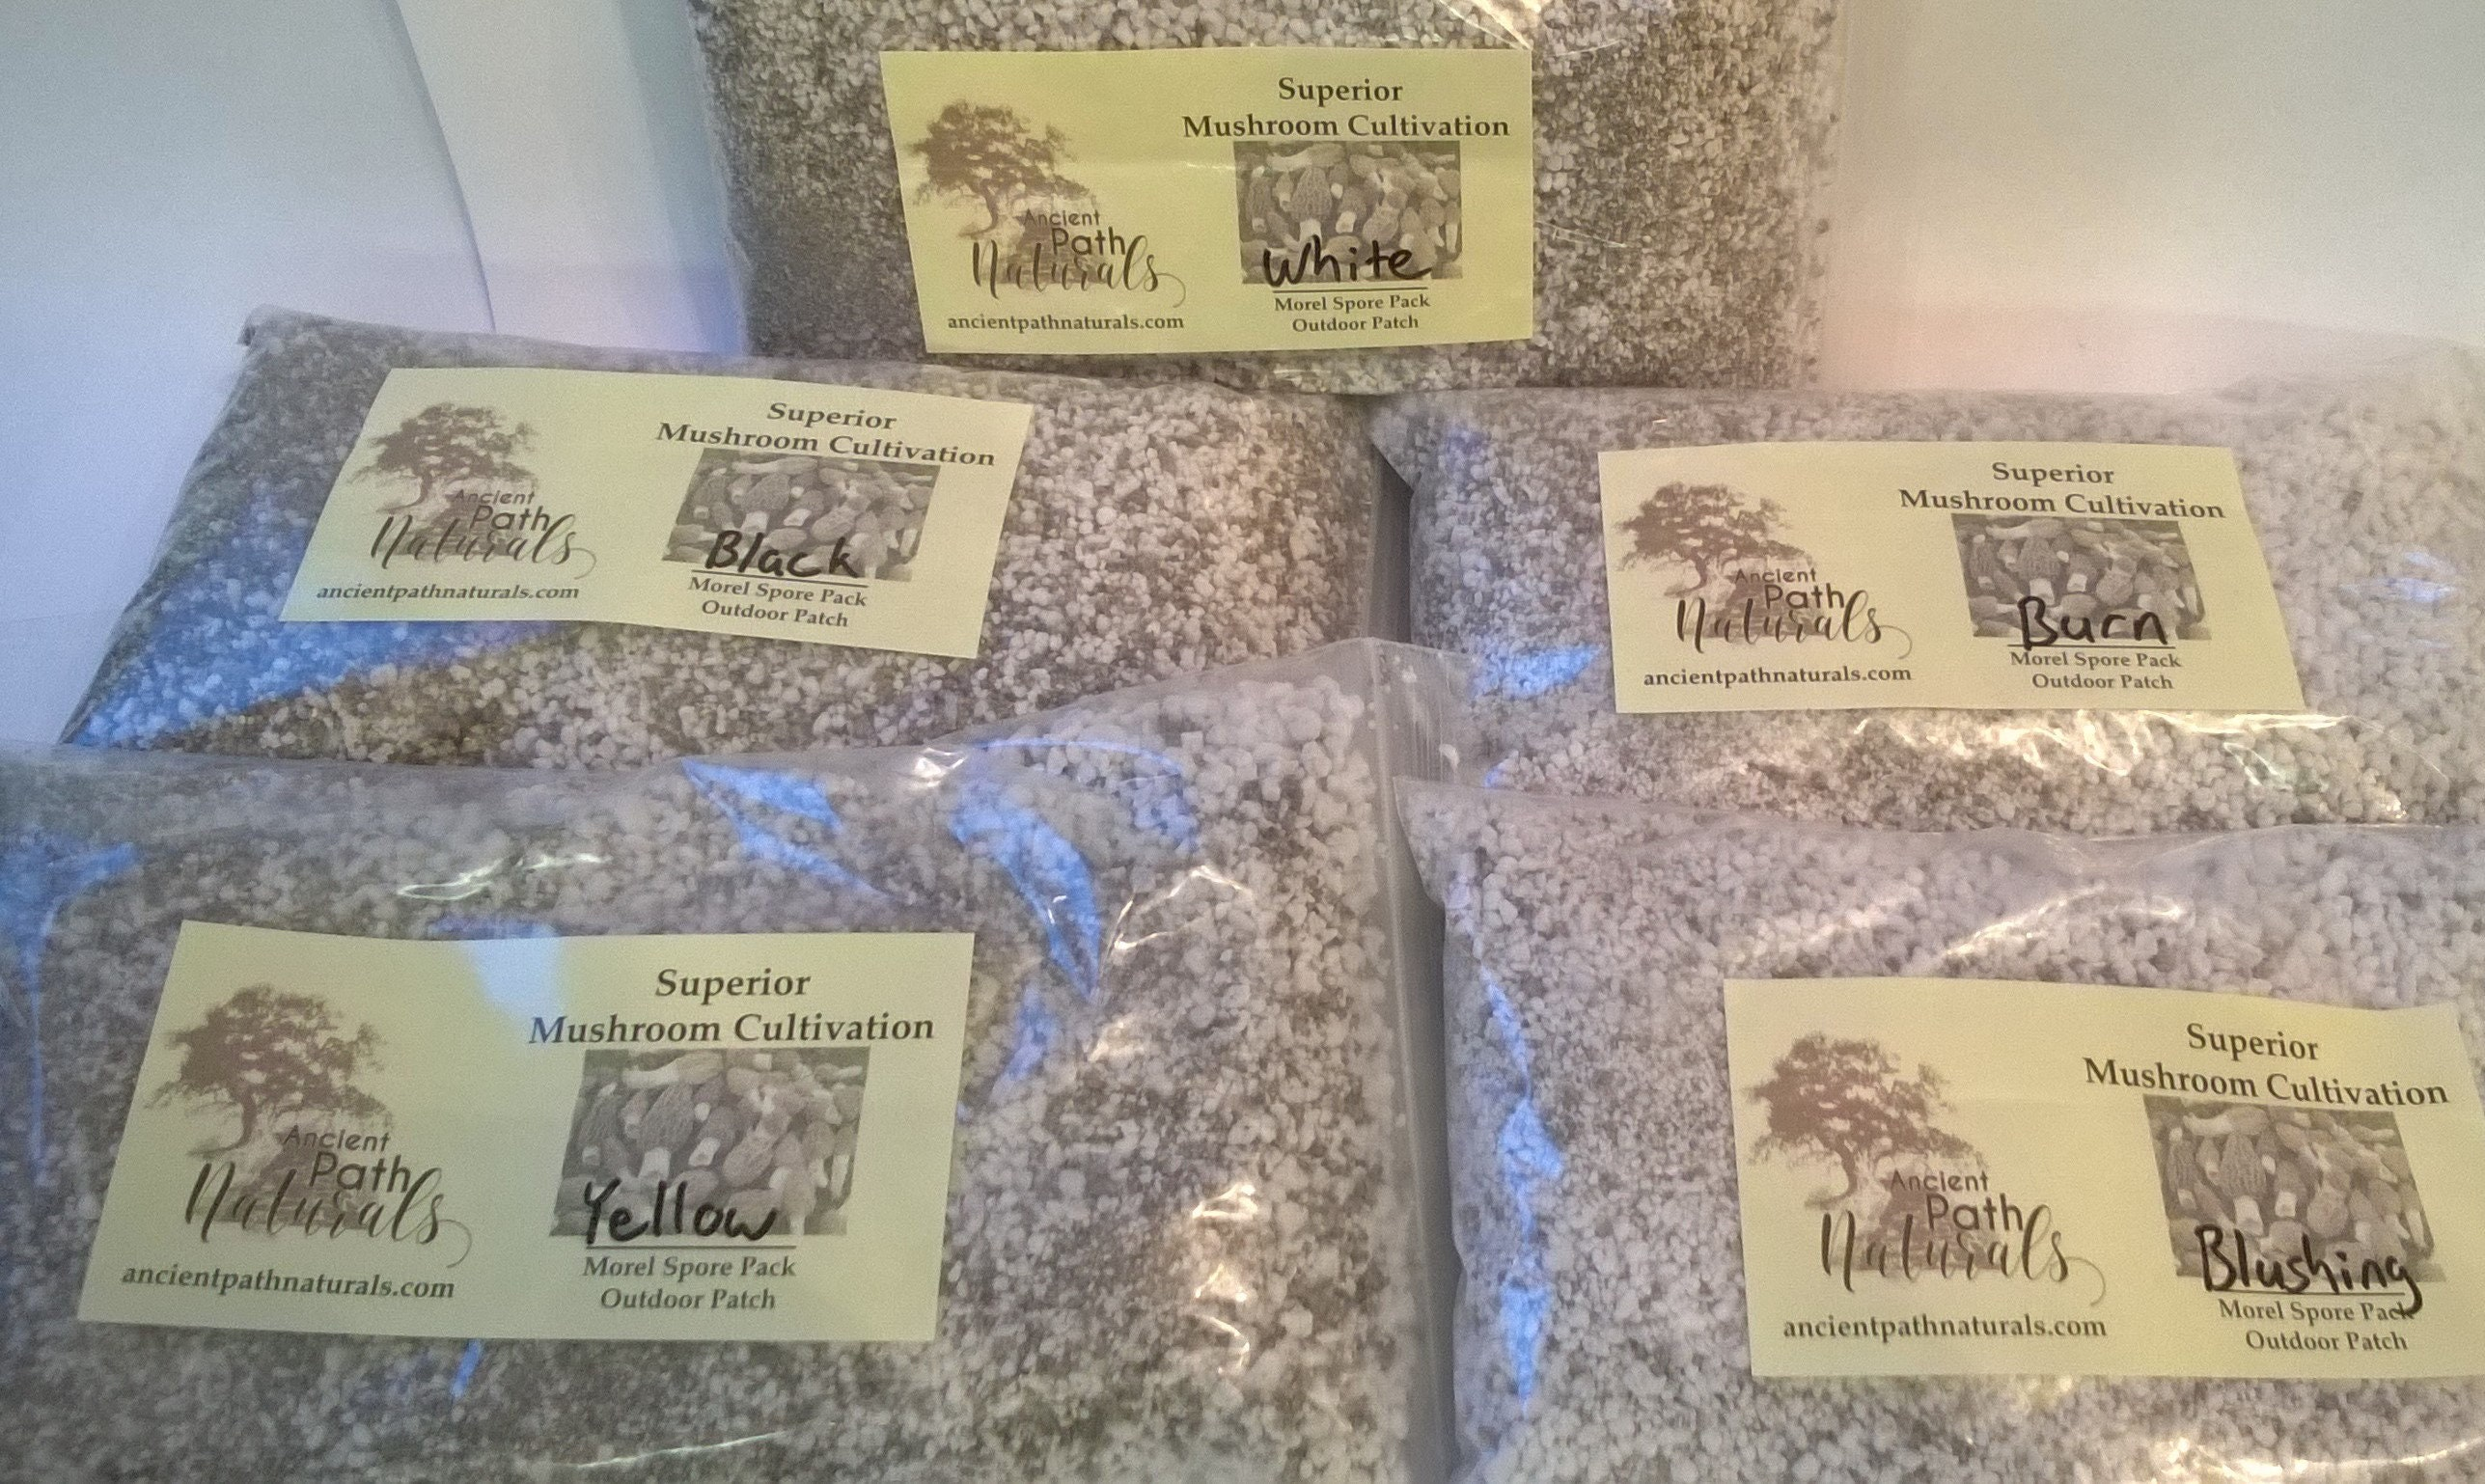 Yummy gourmet Yellow Morel Mushroom Spores Dried Sawdust grow Bag Spore  Kit